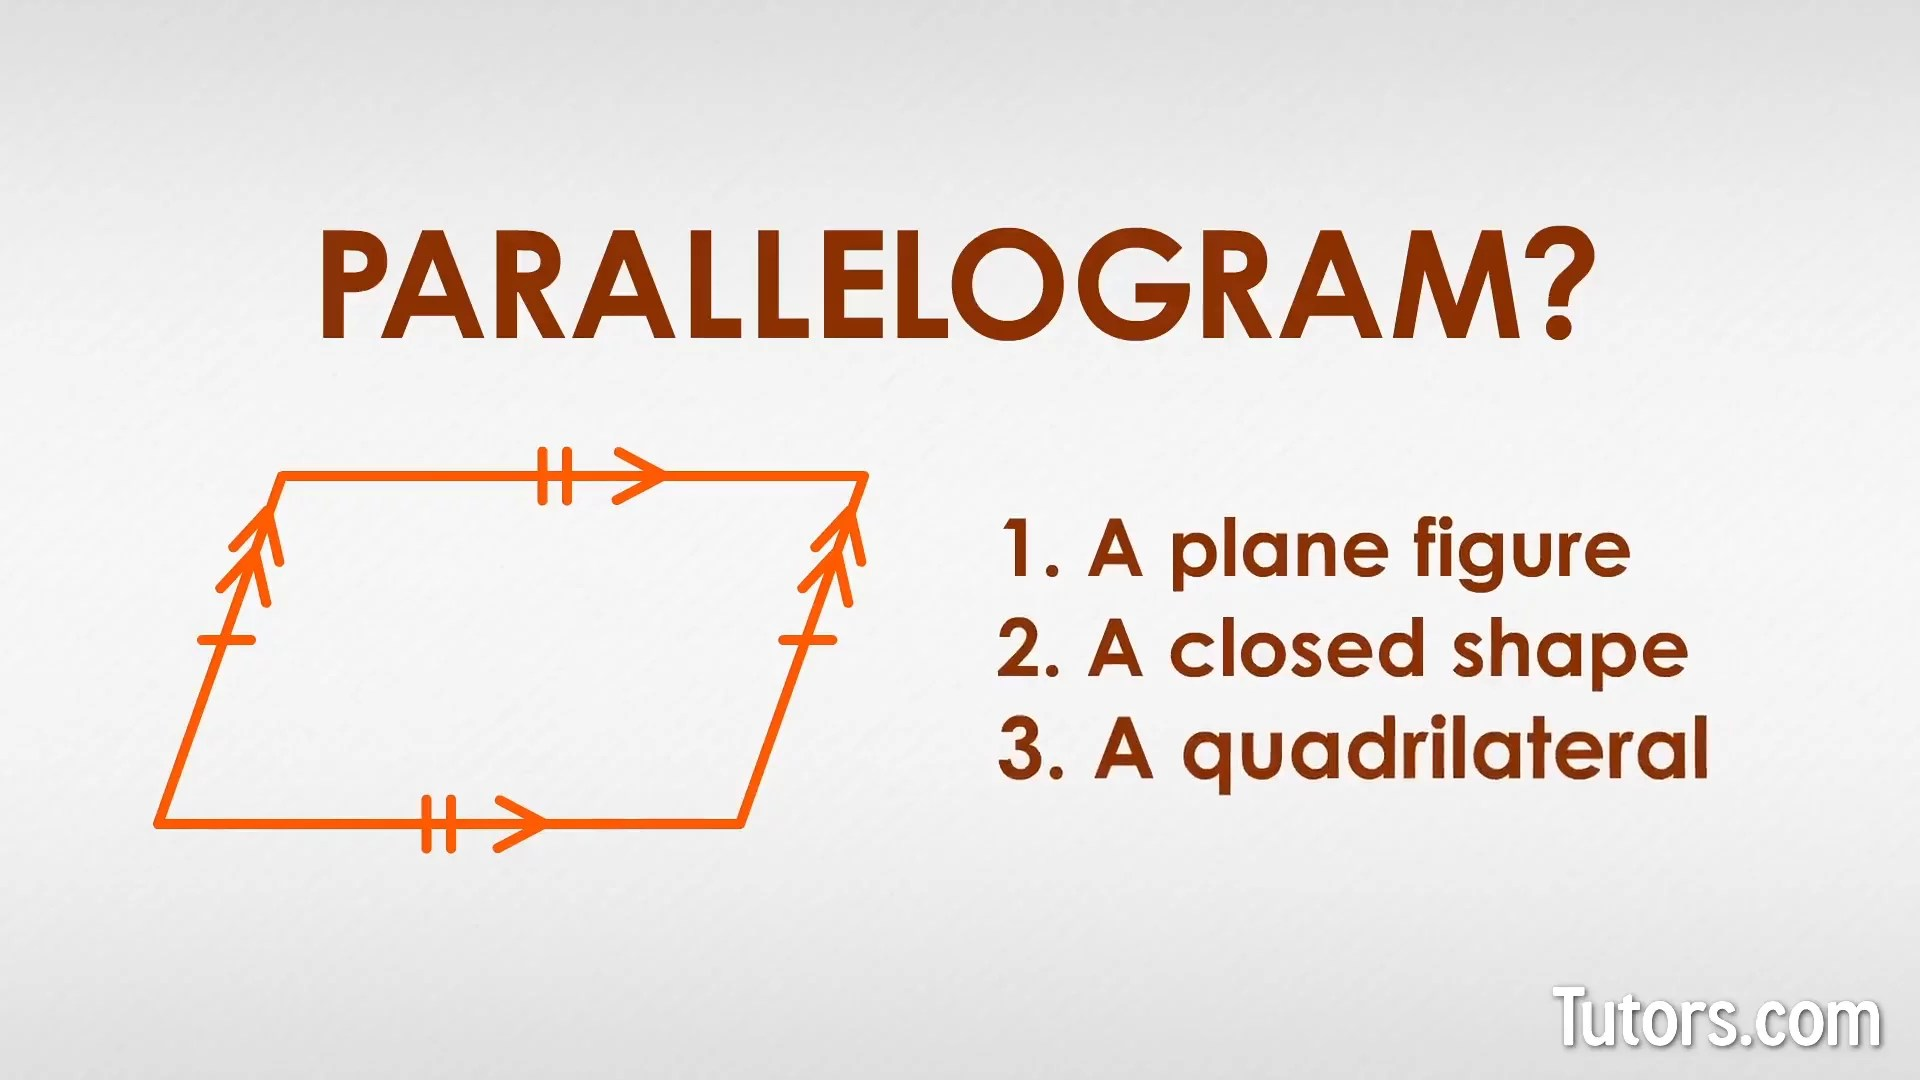 hight resolution of What is a Parallelogram? (Definition \u0026 Properties) // Tutors.com